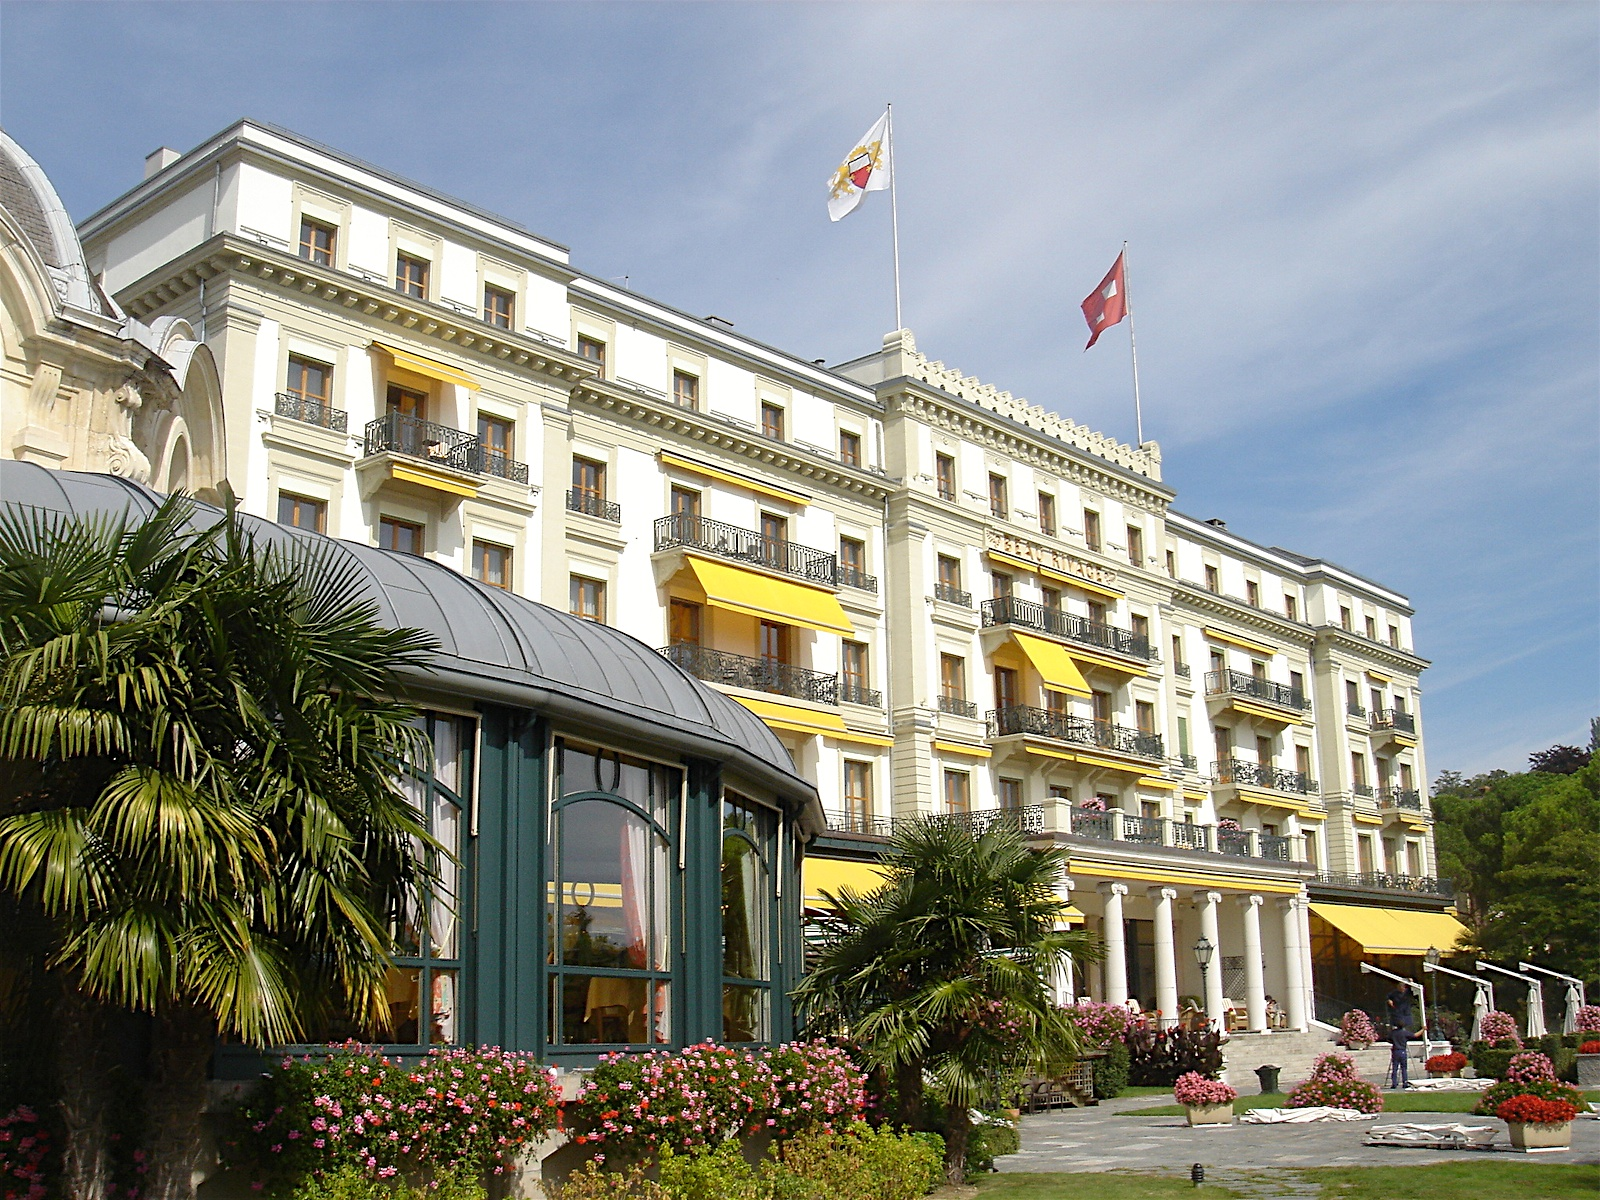 World top hotels beau rivage palace lausanne switzerland for Hotel palace